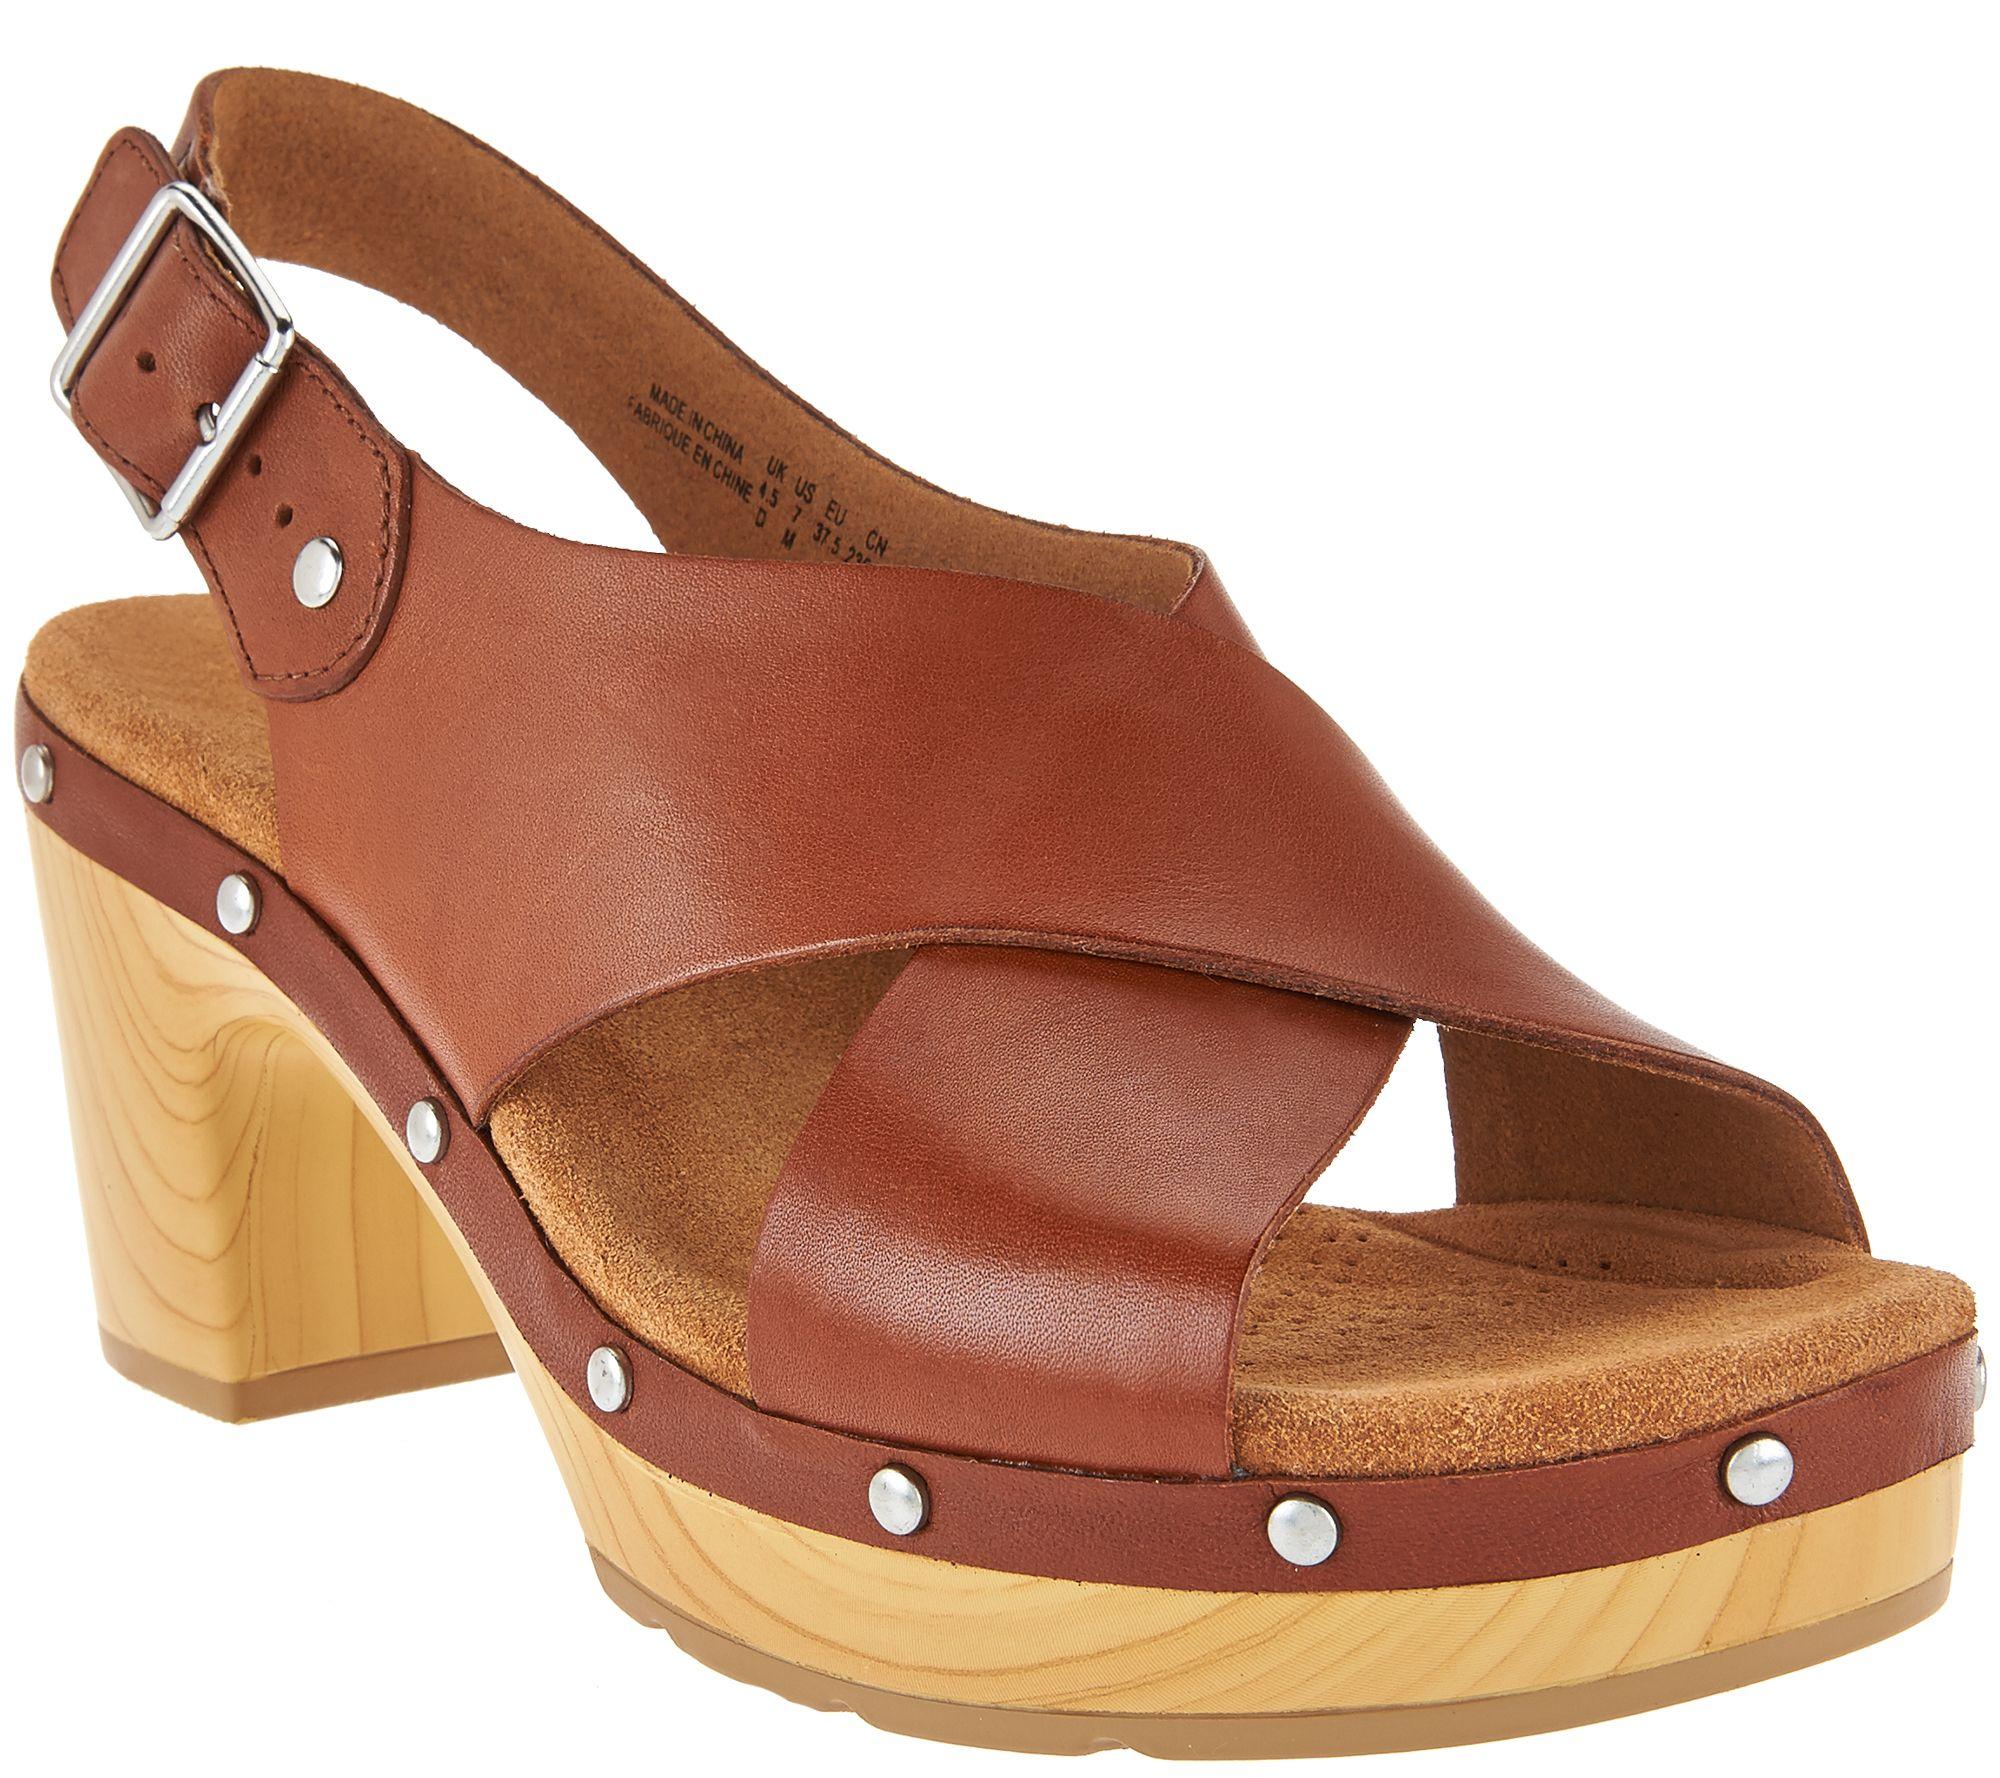 99765740a088fc Clarks Artisan Leather Slingback Sandals - Ledella Club - Page 1 — QVC.com